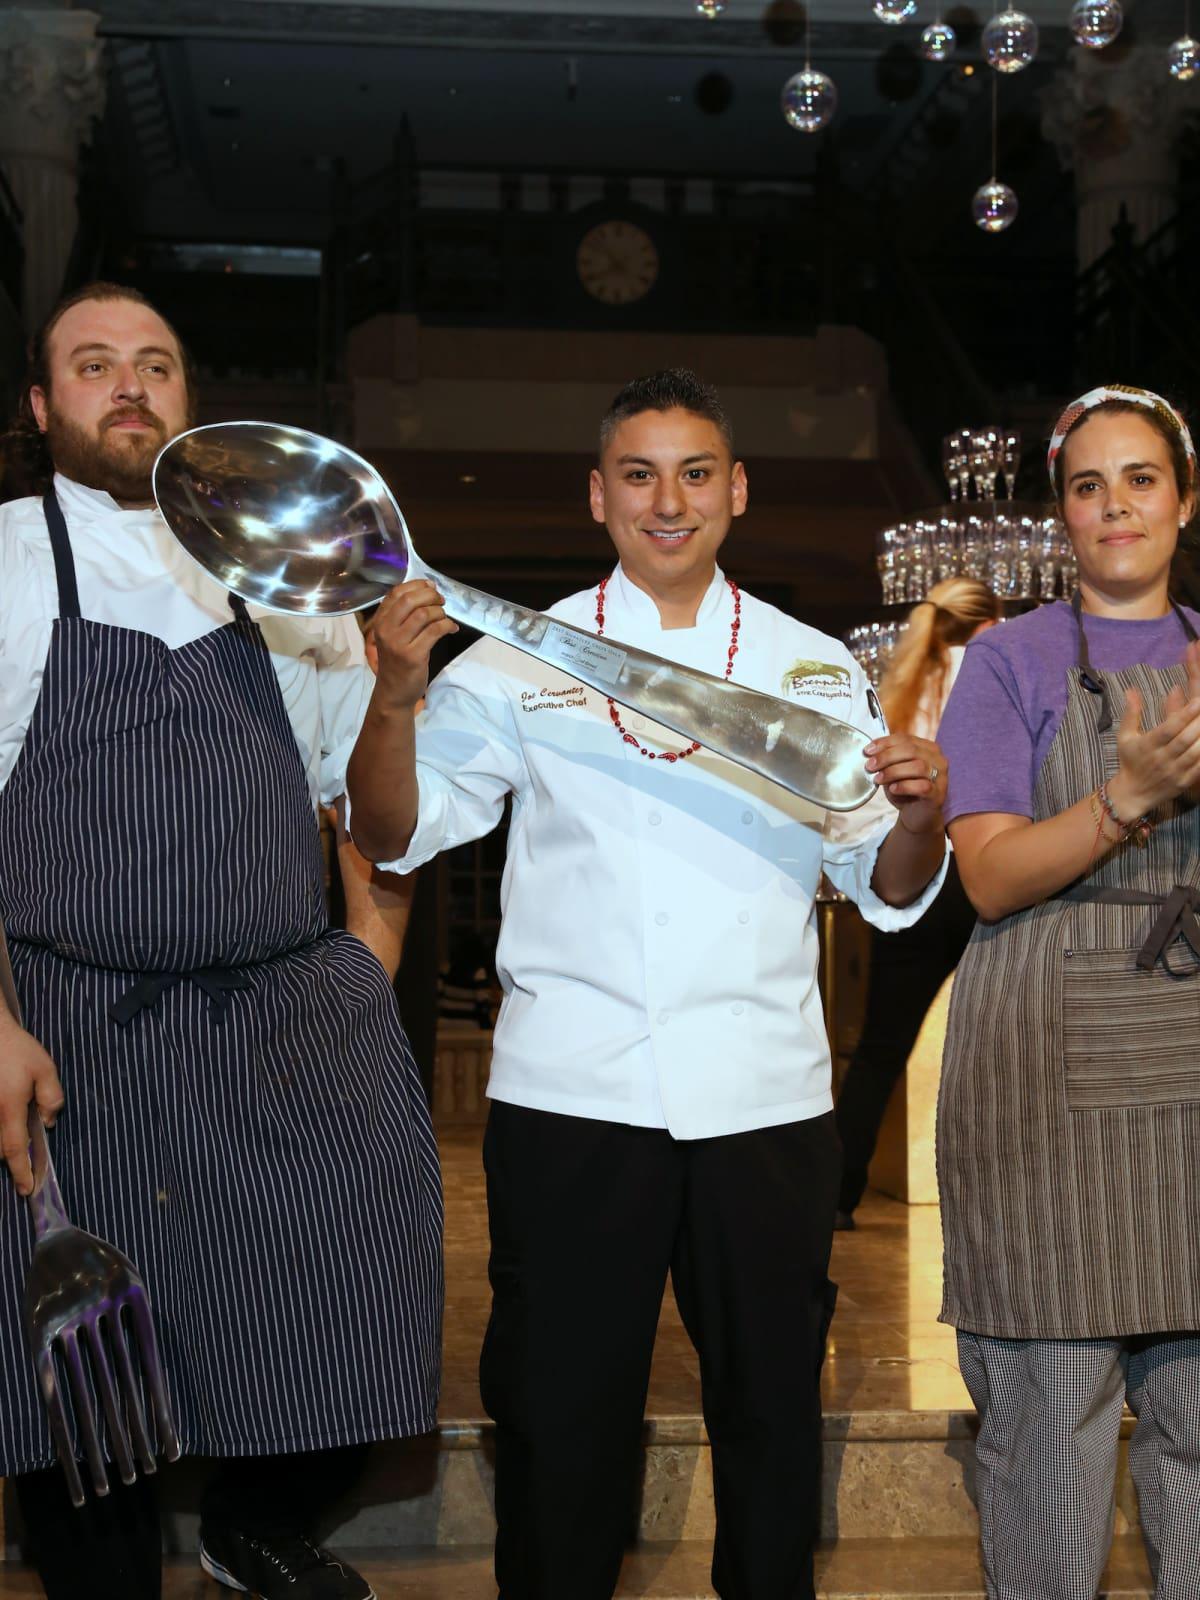 Houston, March of Dimes Signature Chefs, November 2017, executive chef Joe Cervantez of Brennan's